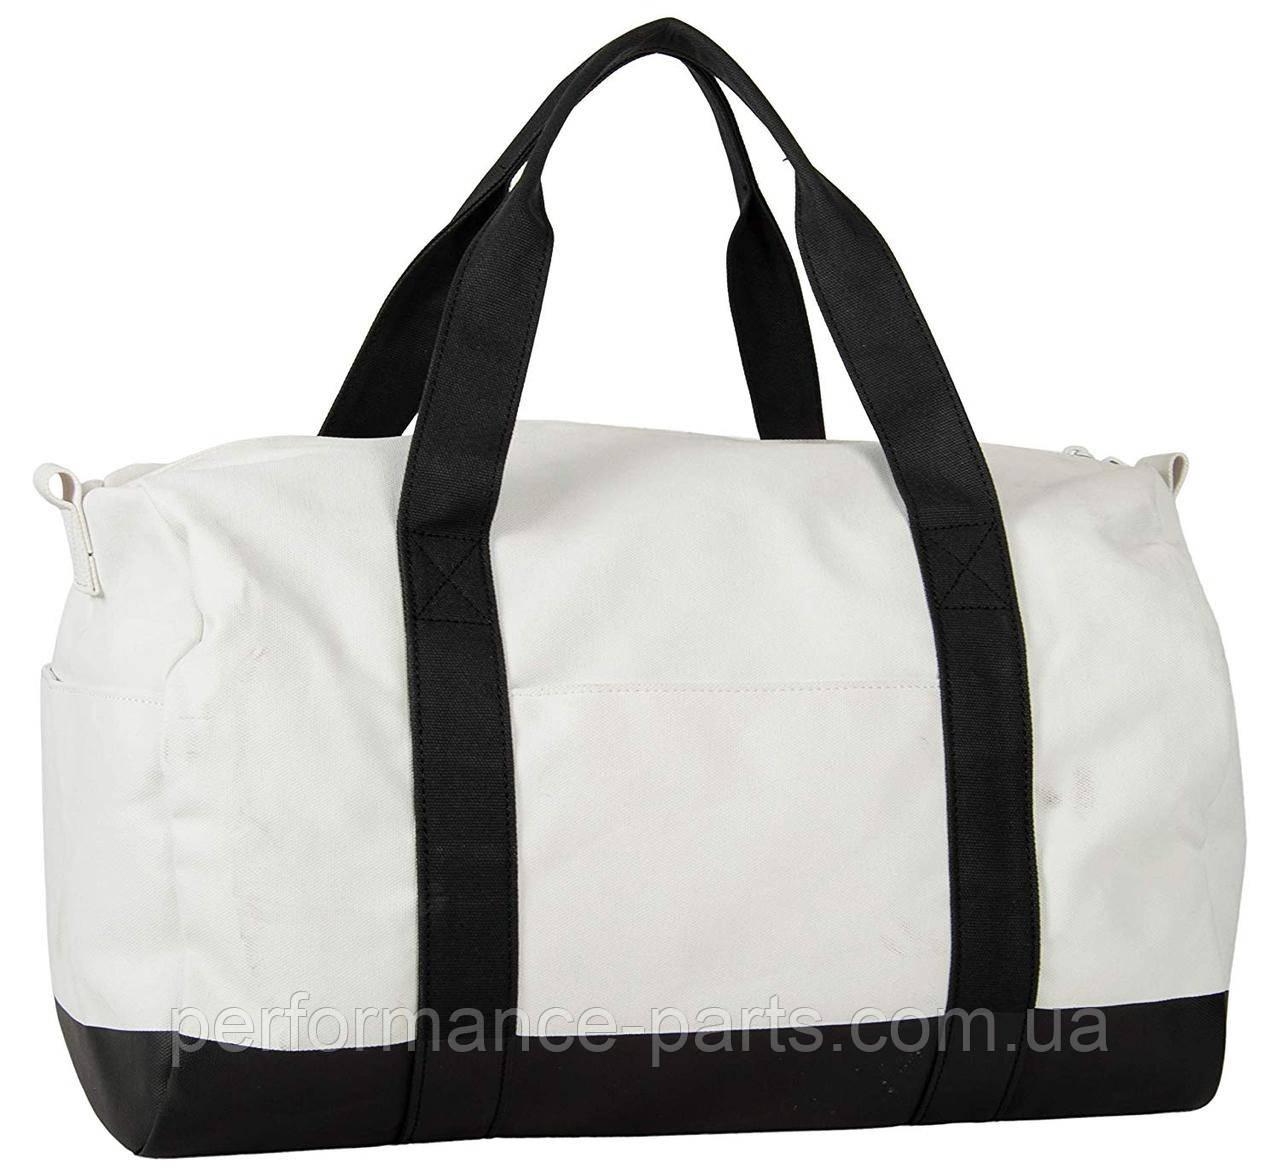 Спортивная сумка MINI Duffle Bag Colour Block, White/Black  80222445671